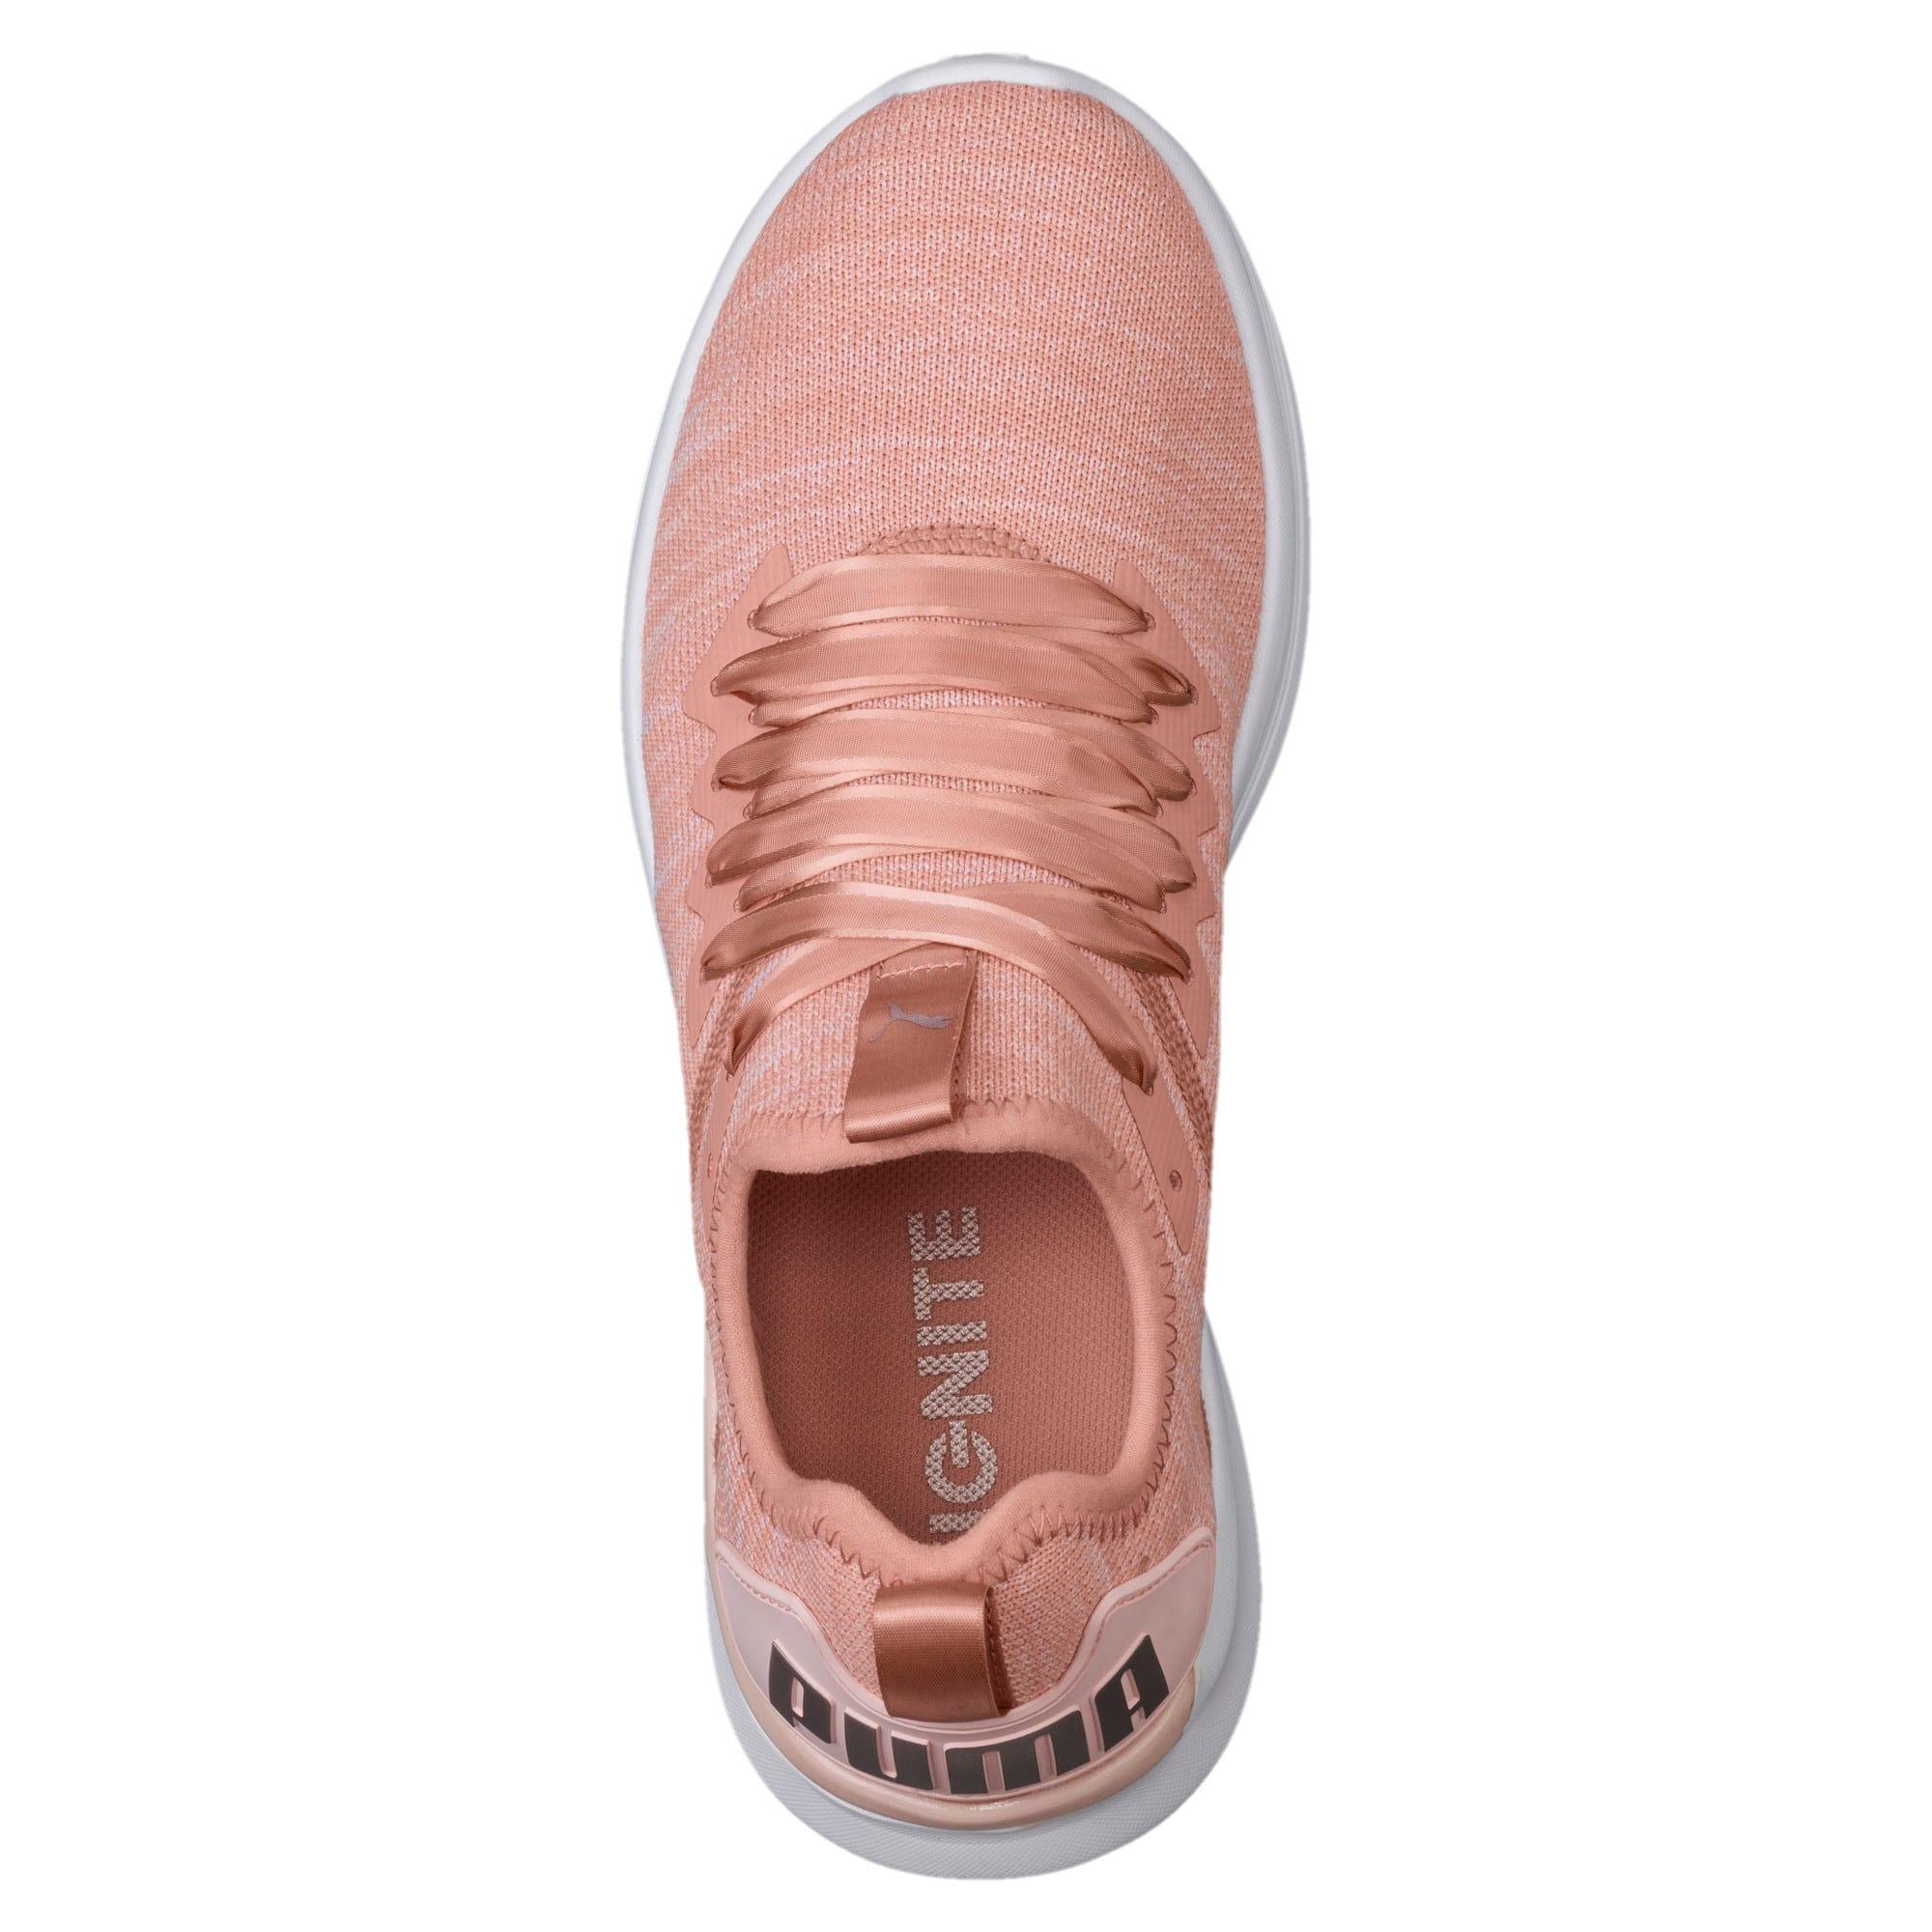 timeless design 2a9f6 e527c IGNITE Flash evoKNIT Satin En Pointe Women's Sneakers